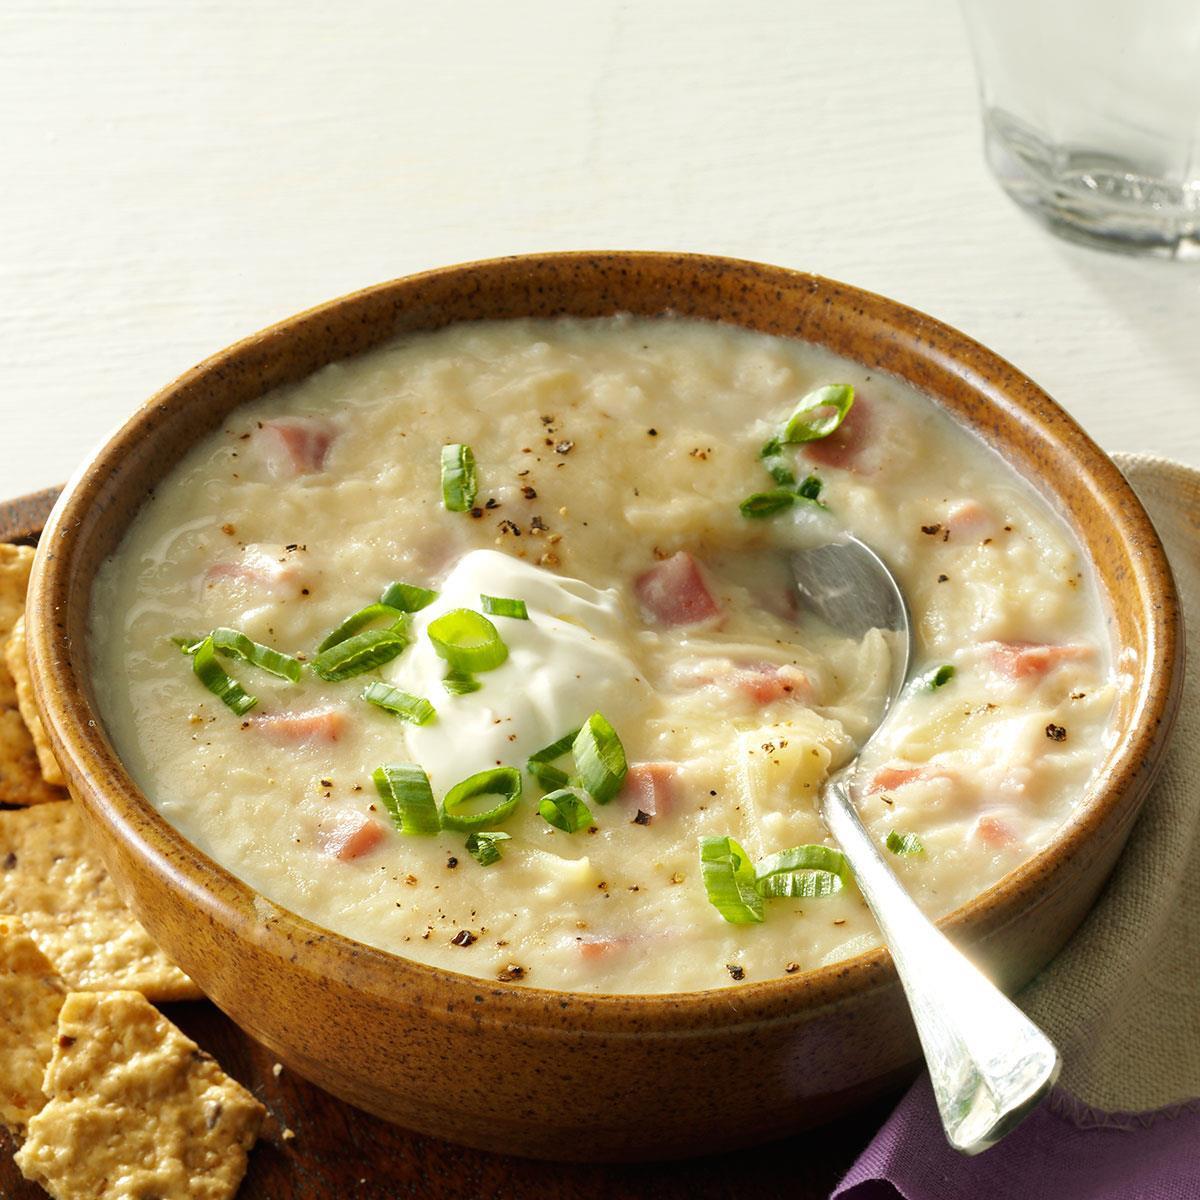 Slow Cooker Ham And Potato Soup  Slow Cooker Potato & Ham Soup Recipe